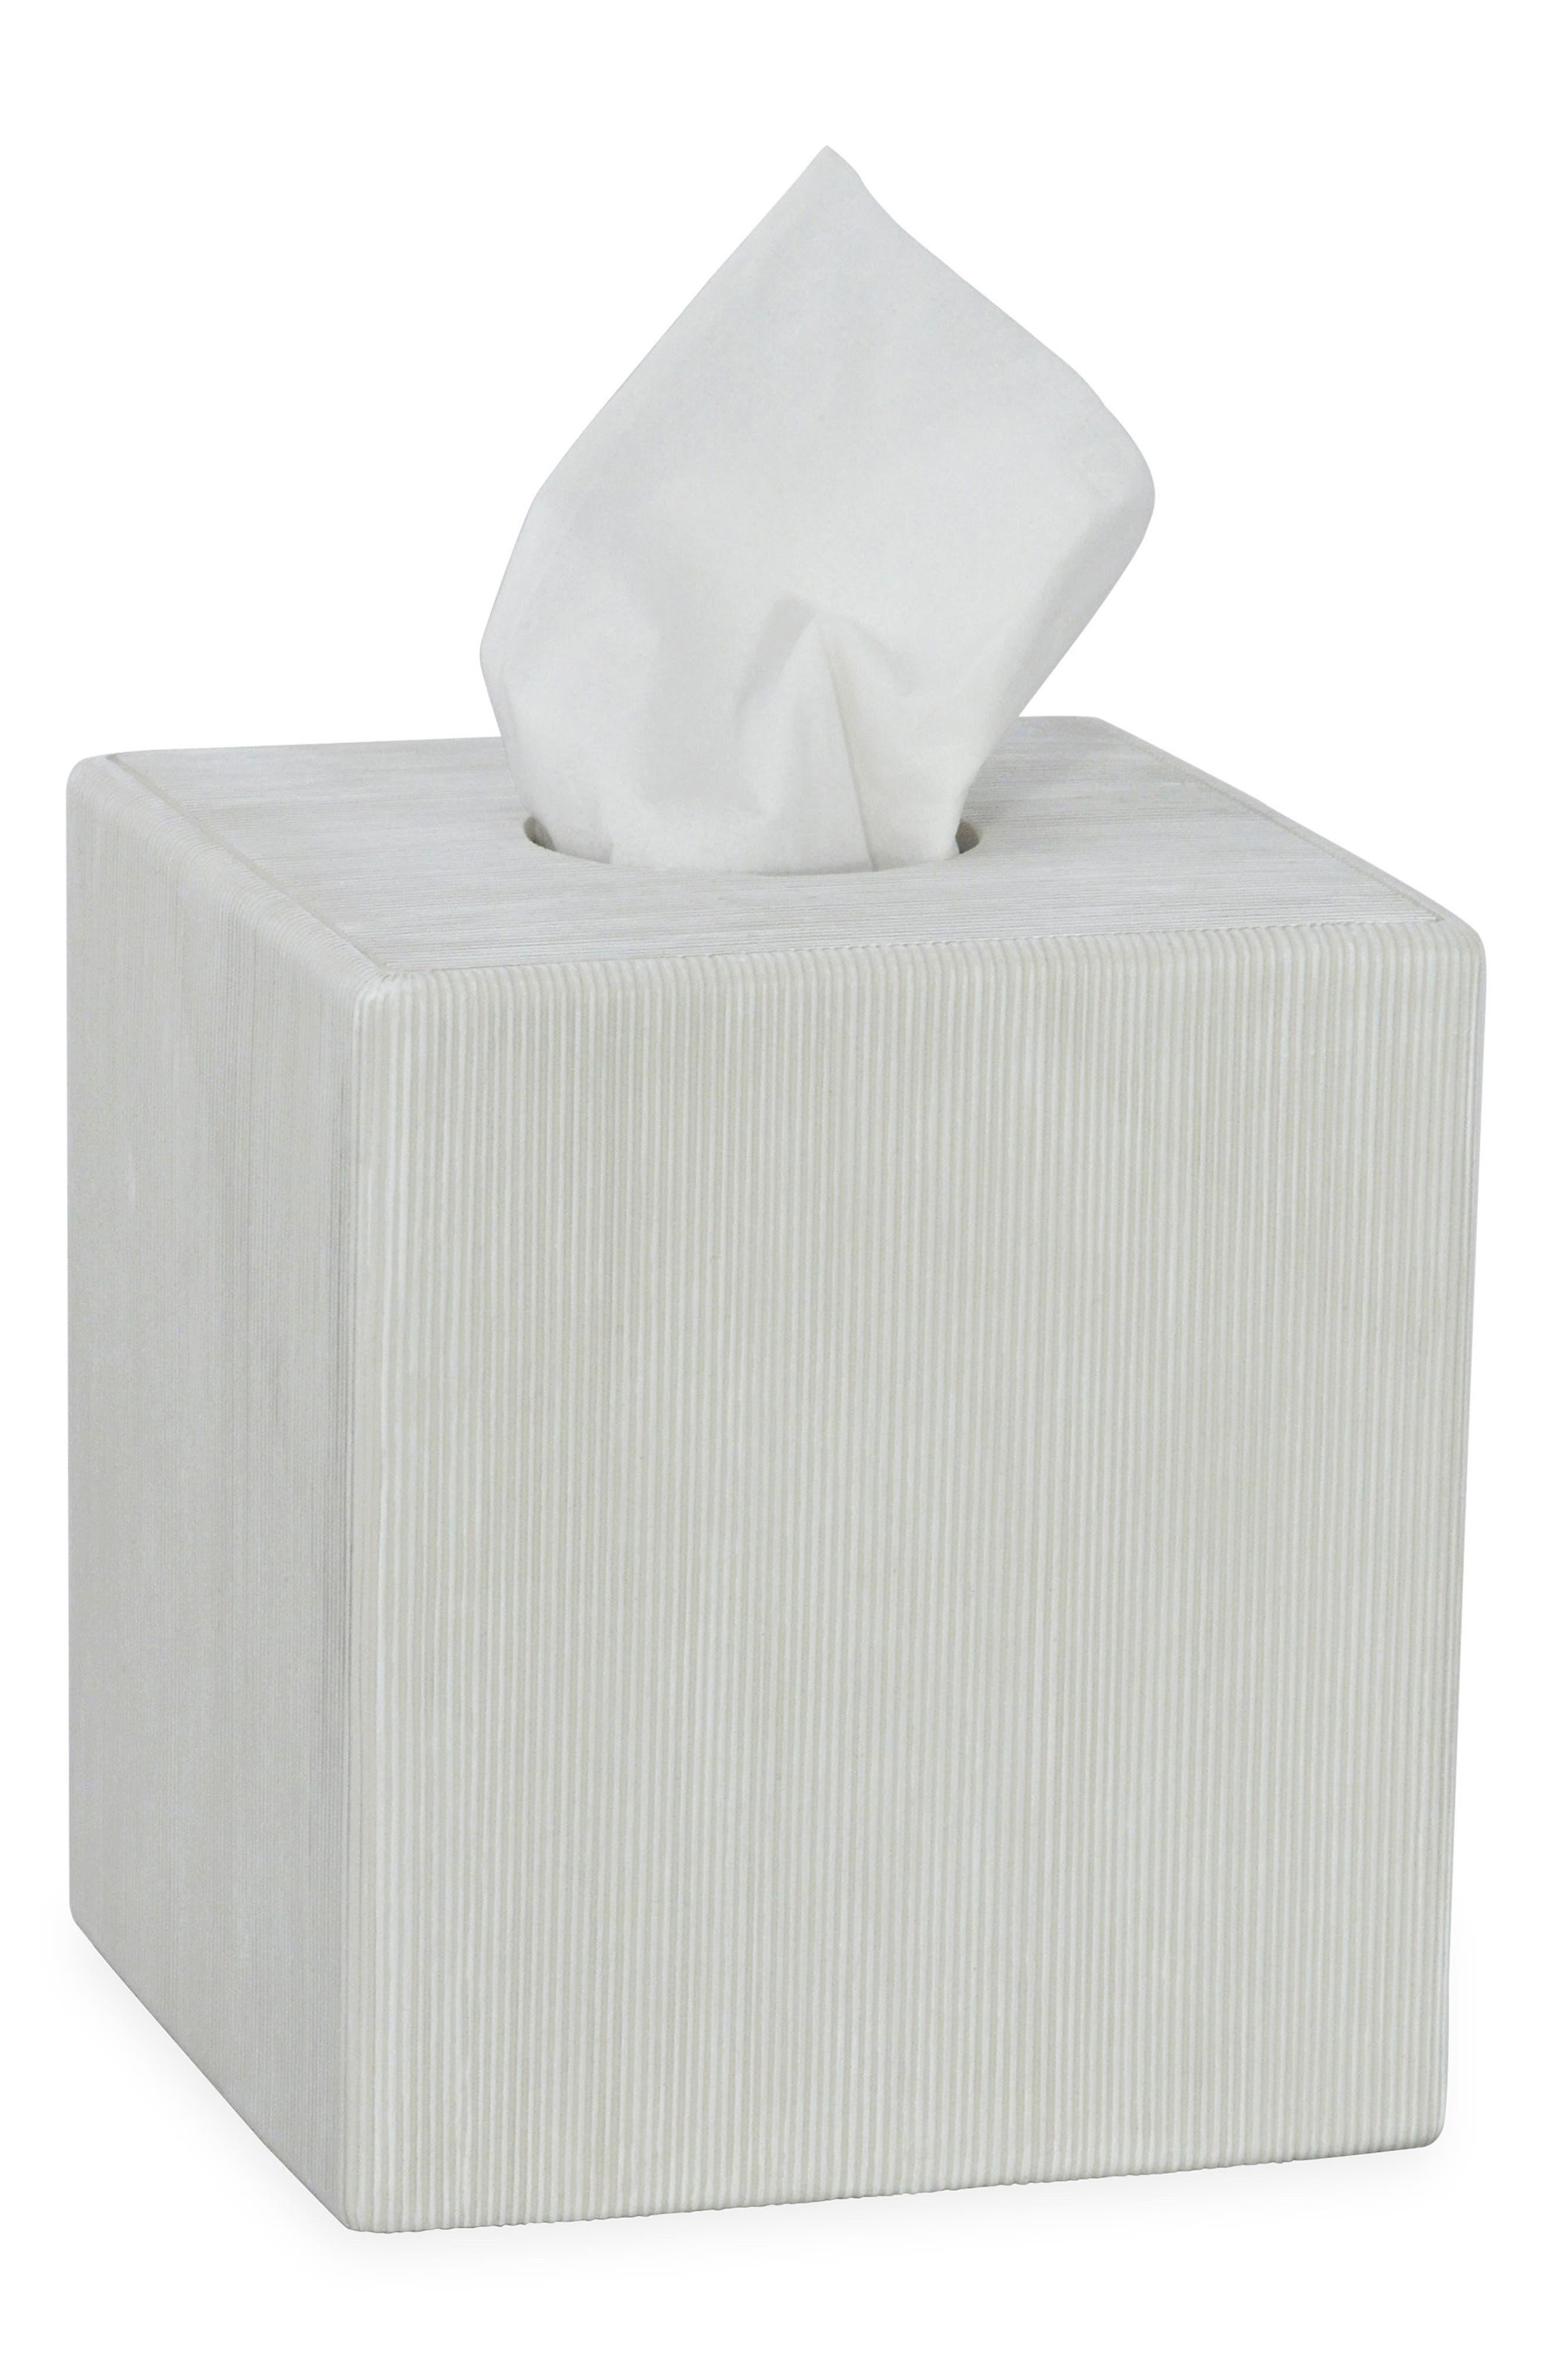 DKNY, Fine Lines Ceramic Tissue Box Cover, Main thumbnail 1, color, WHITE